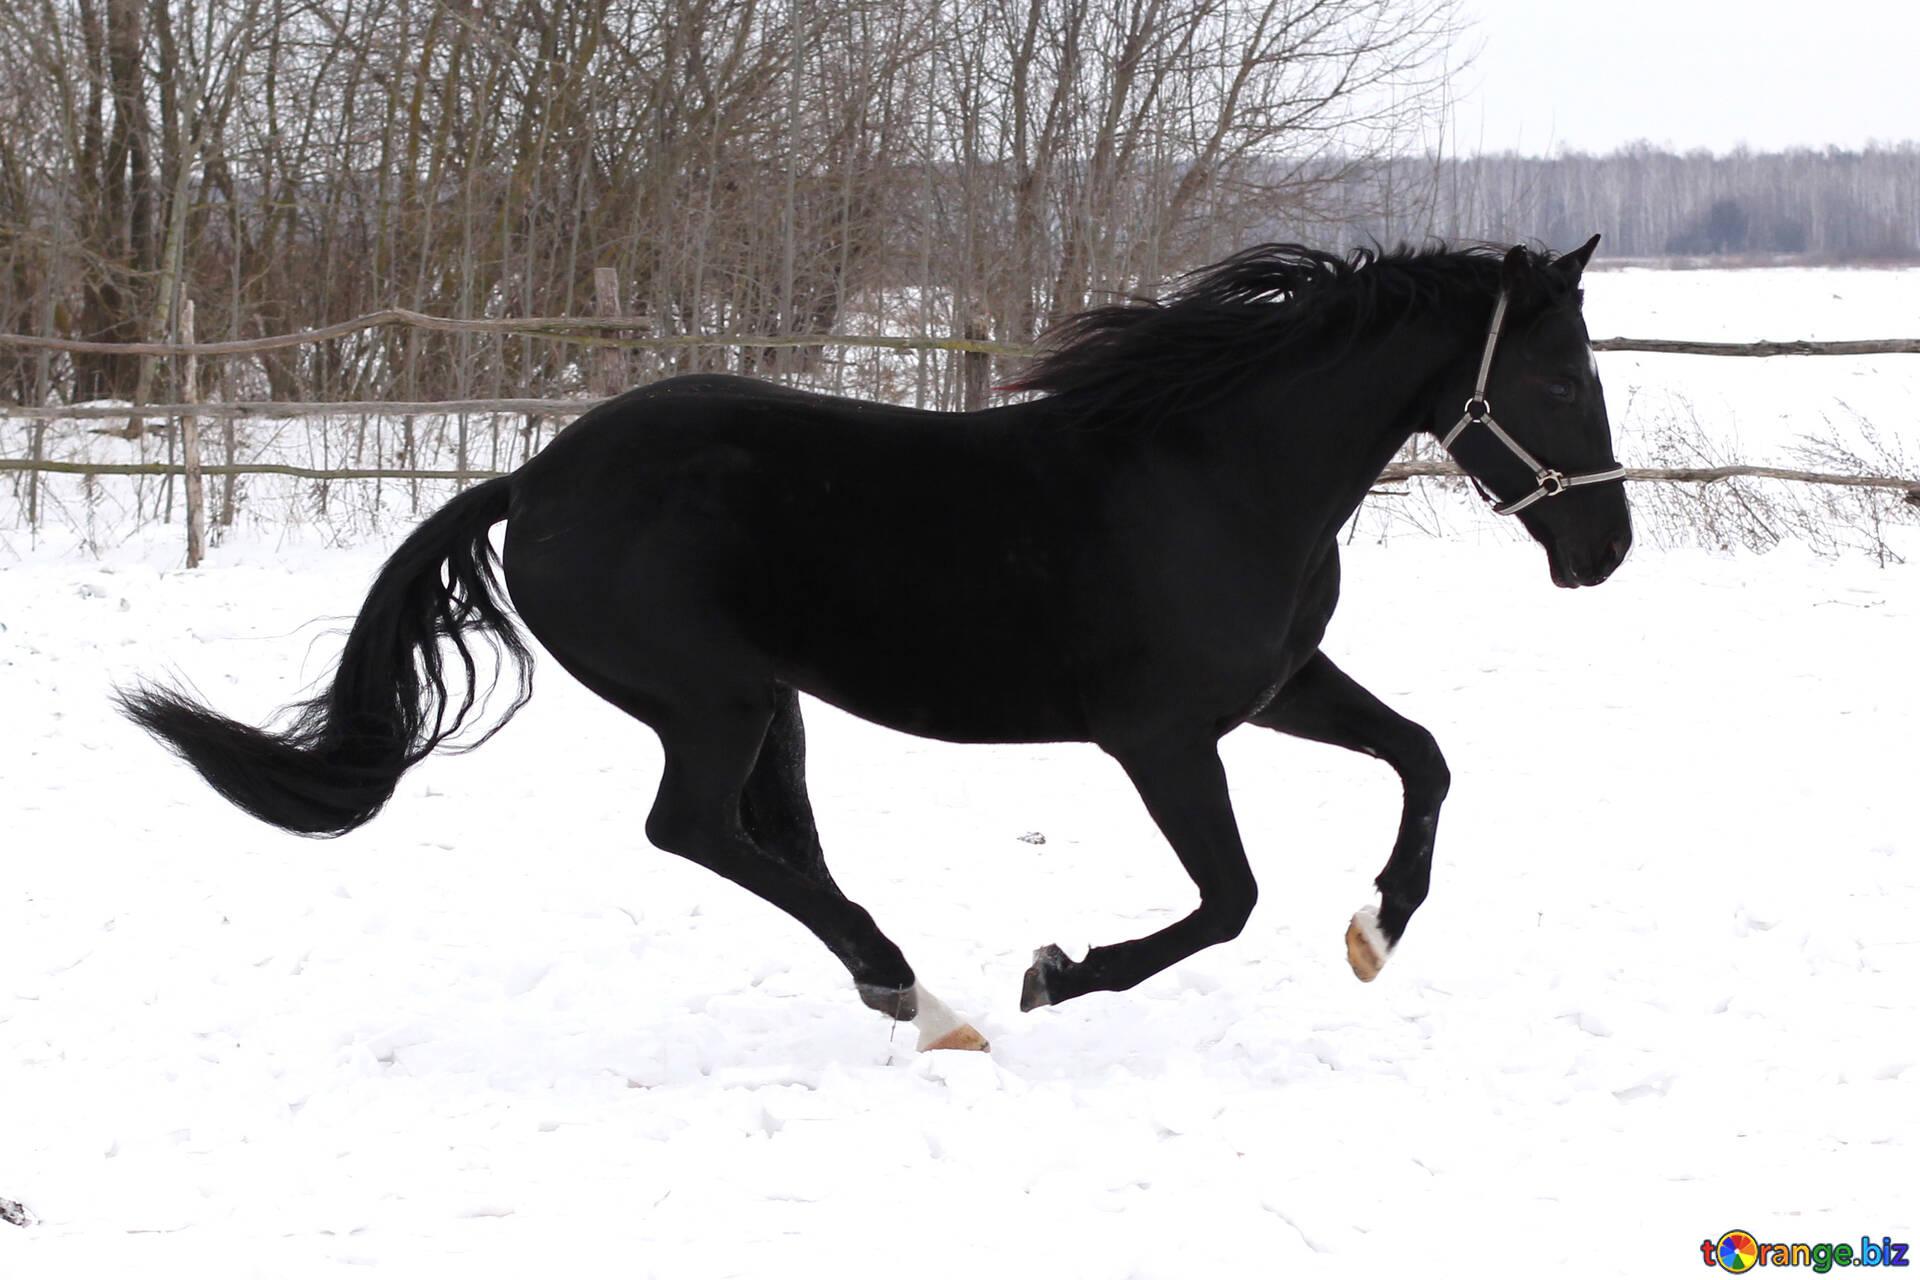 Black Horse Horse Running In Winter Snow 18192